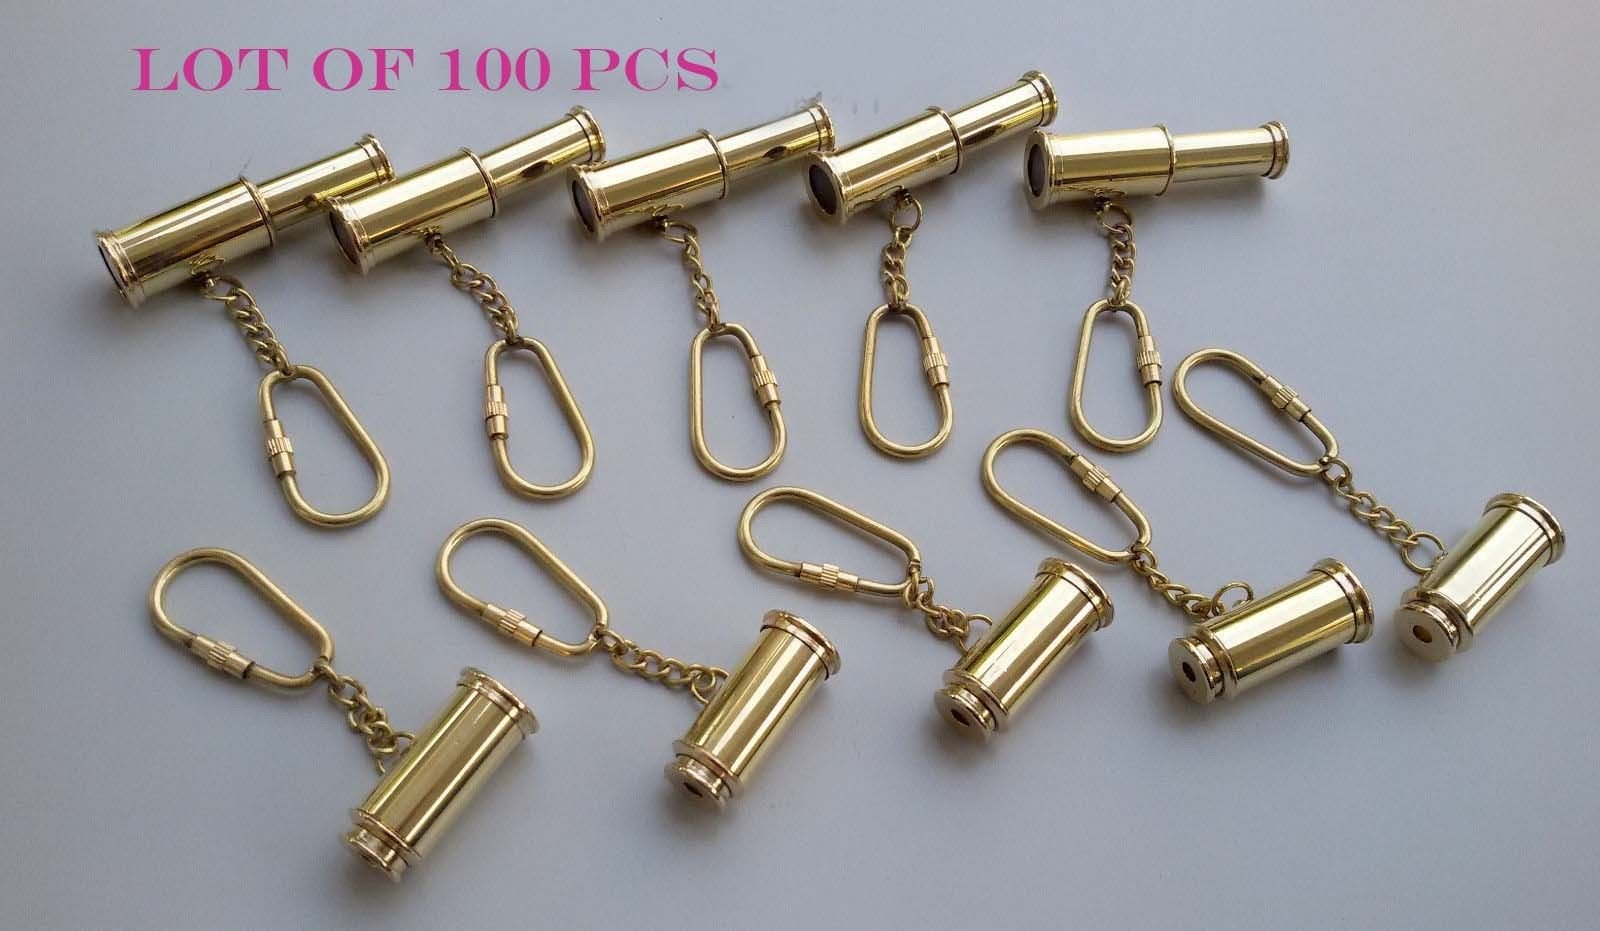 Shaheera Nautical Nautical Brass Telescope Key Chain Antique Handmade Key Ring Lot of 100 Pcs Gift A by shaheera.nautical (Image #2)